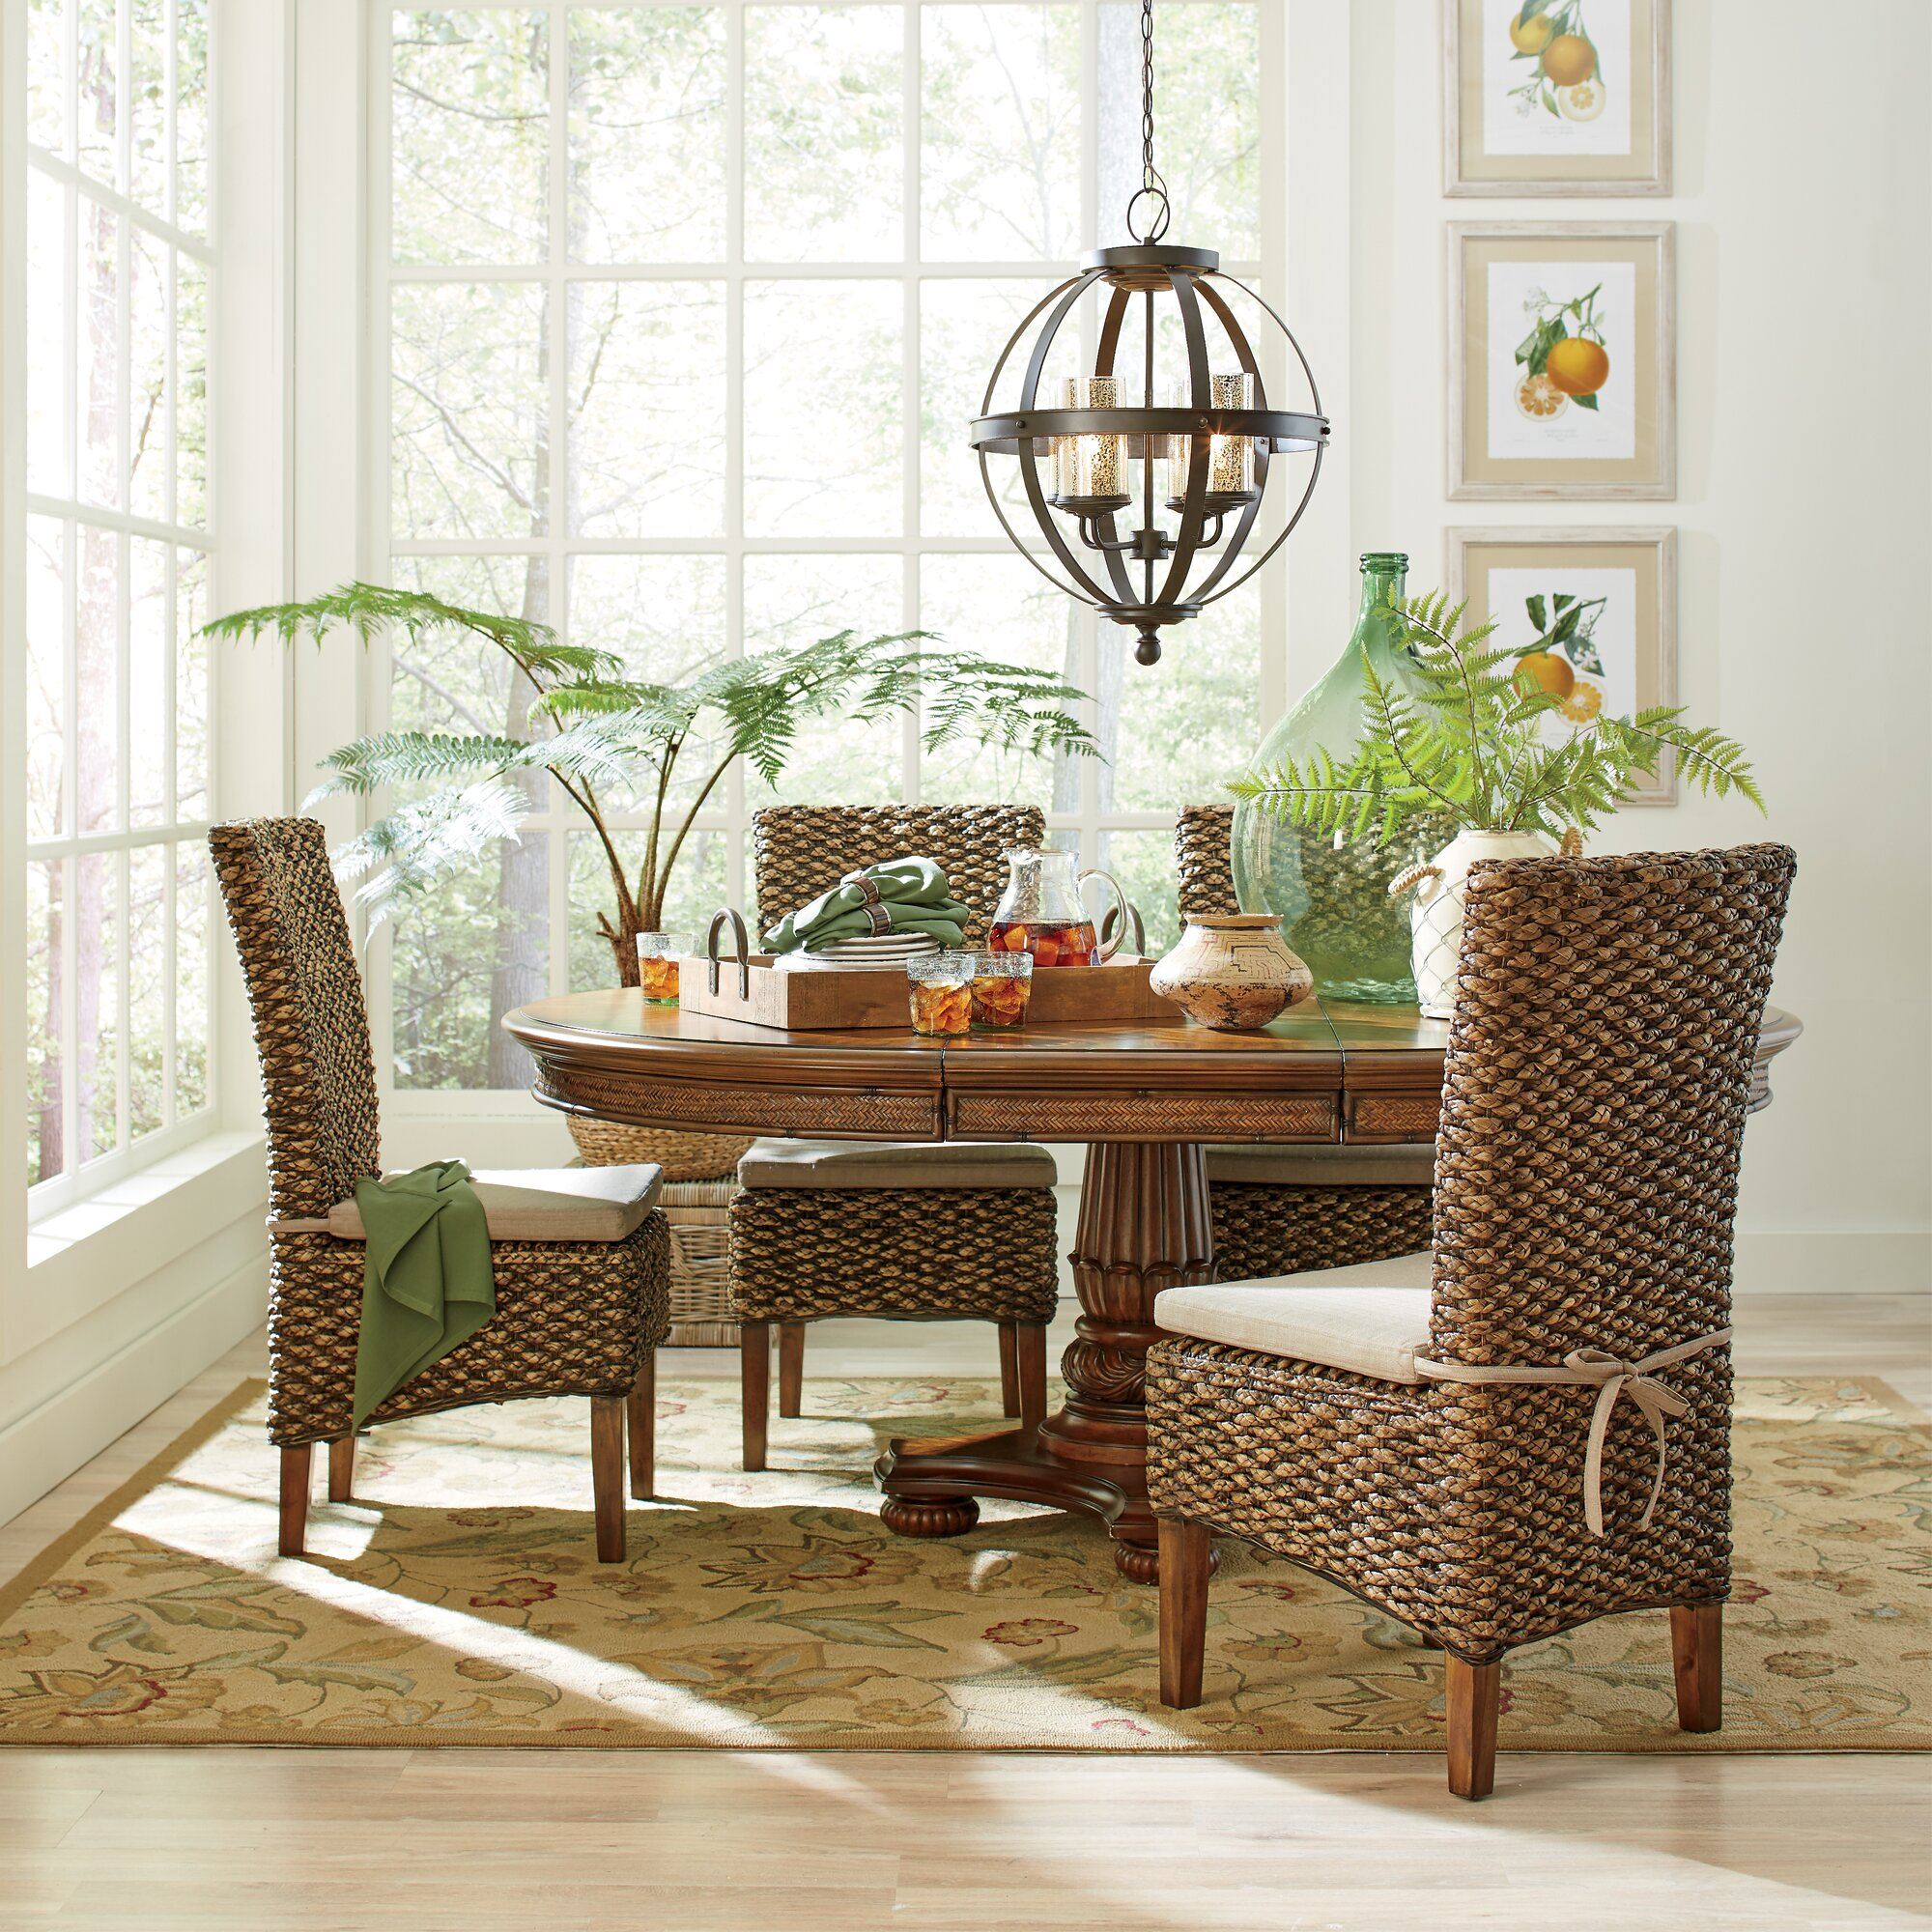 Restoration hardware dining chairs